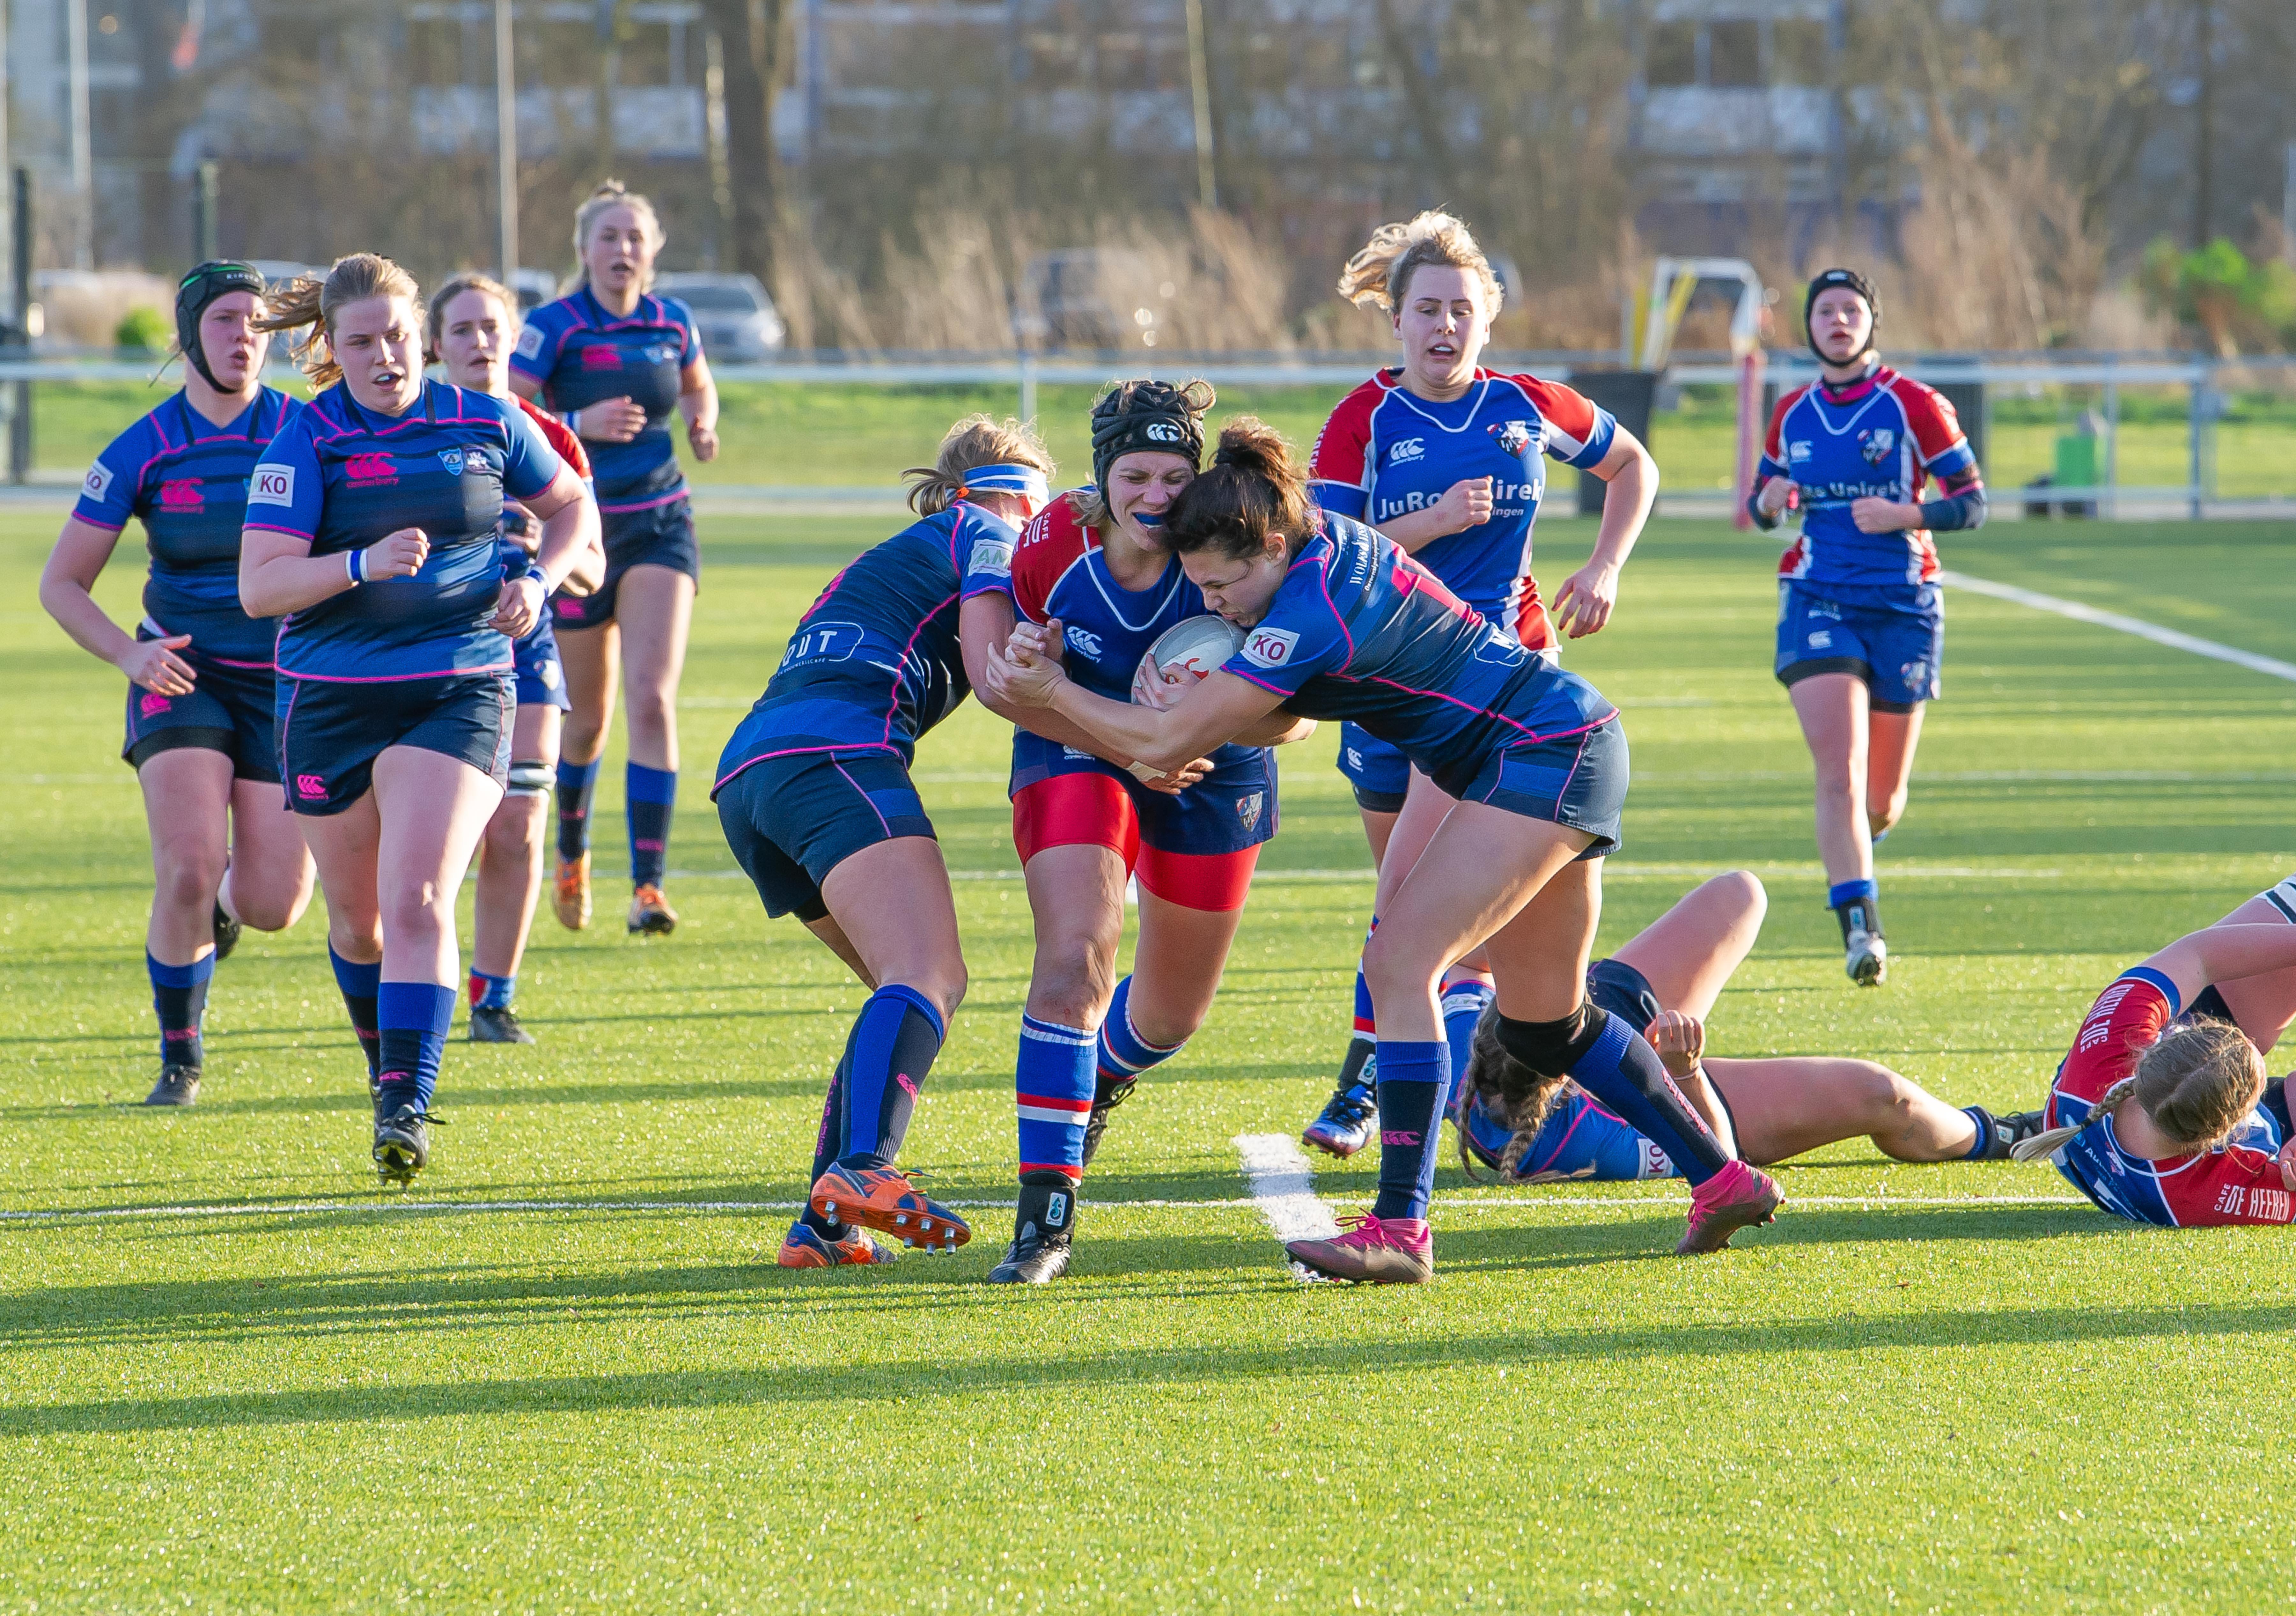 Rugbyclub Waterland breekt met gewoonte, legt diverse speelsters van buitenaf vast en gaat voor de landstitel